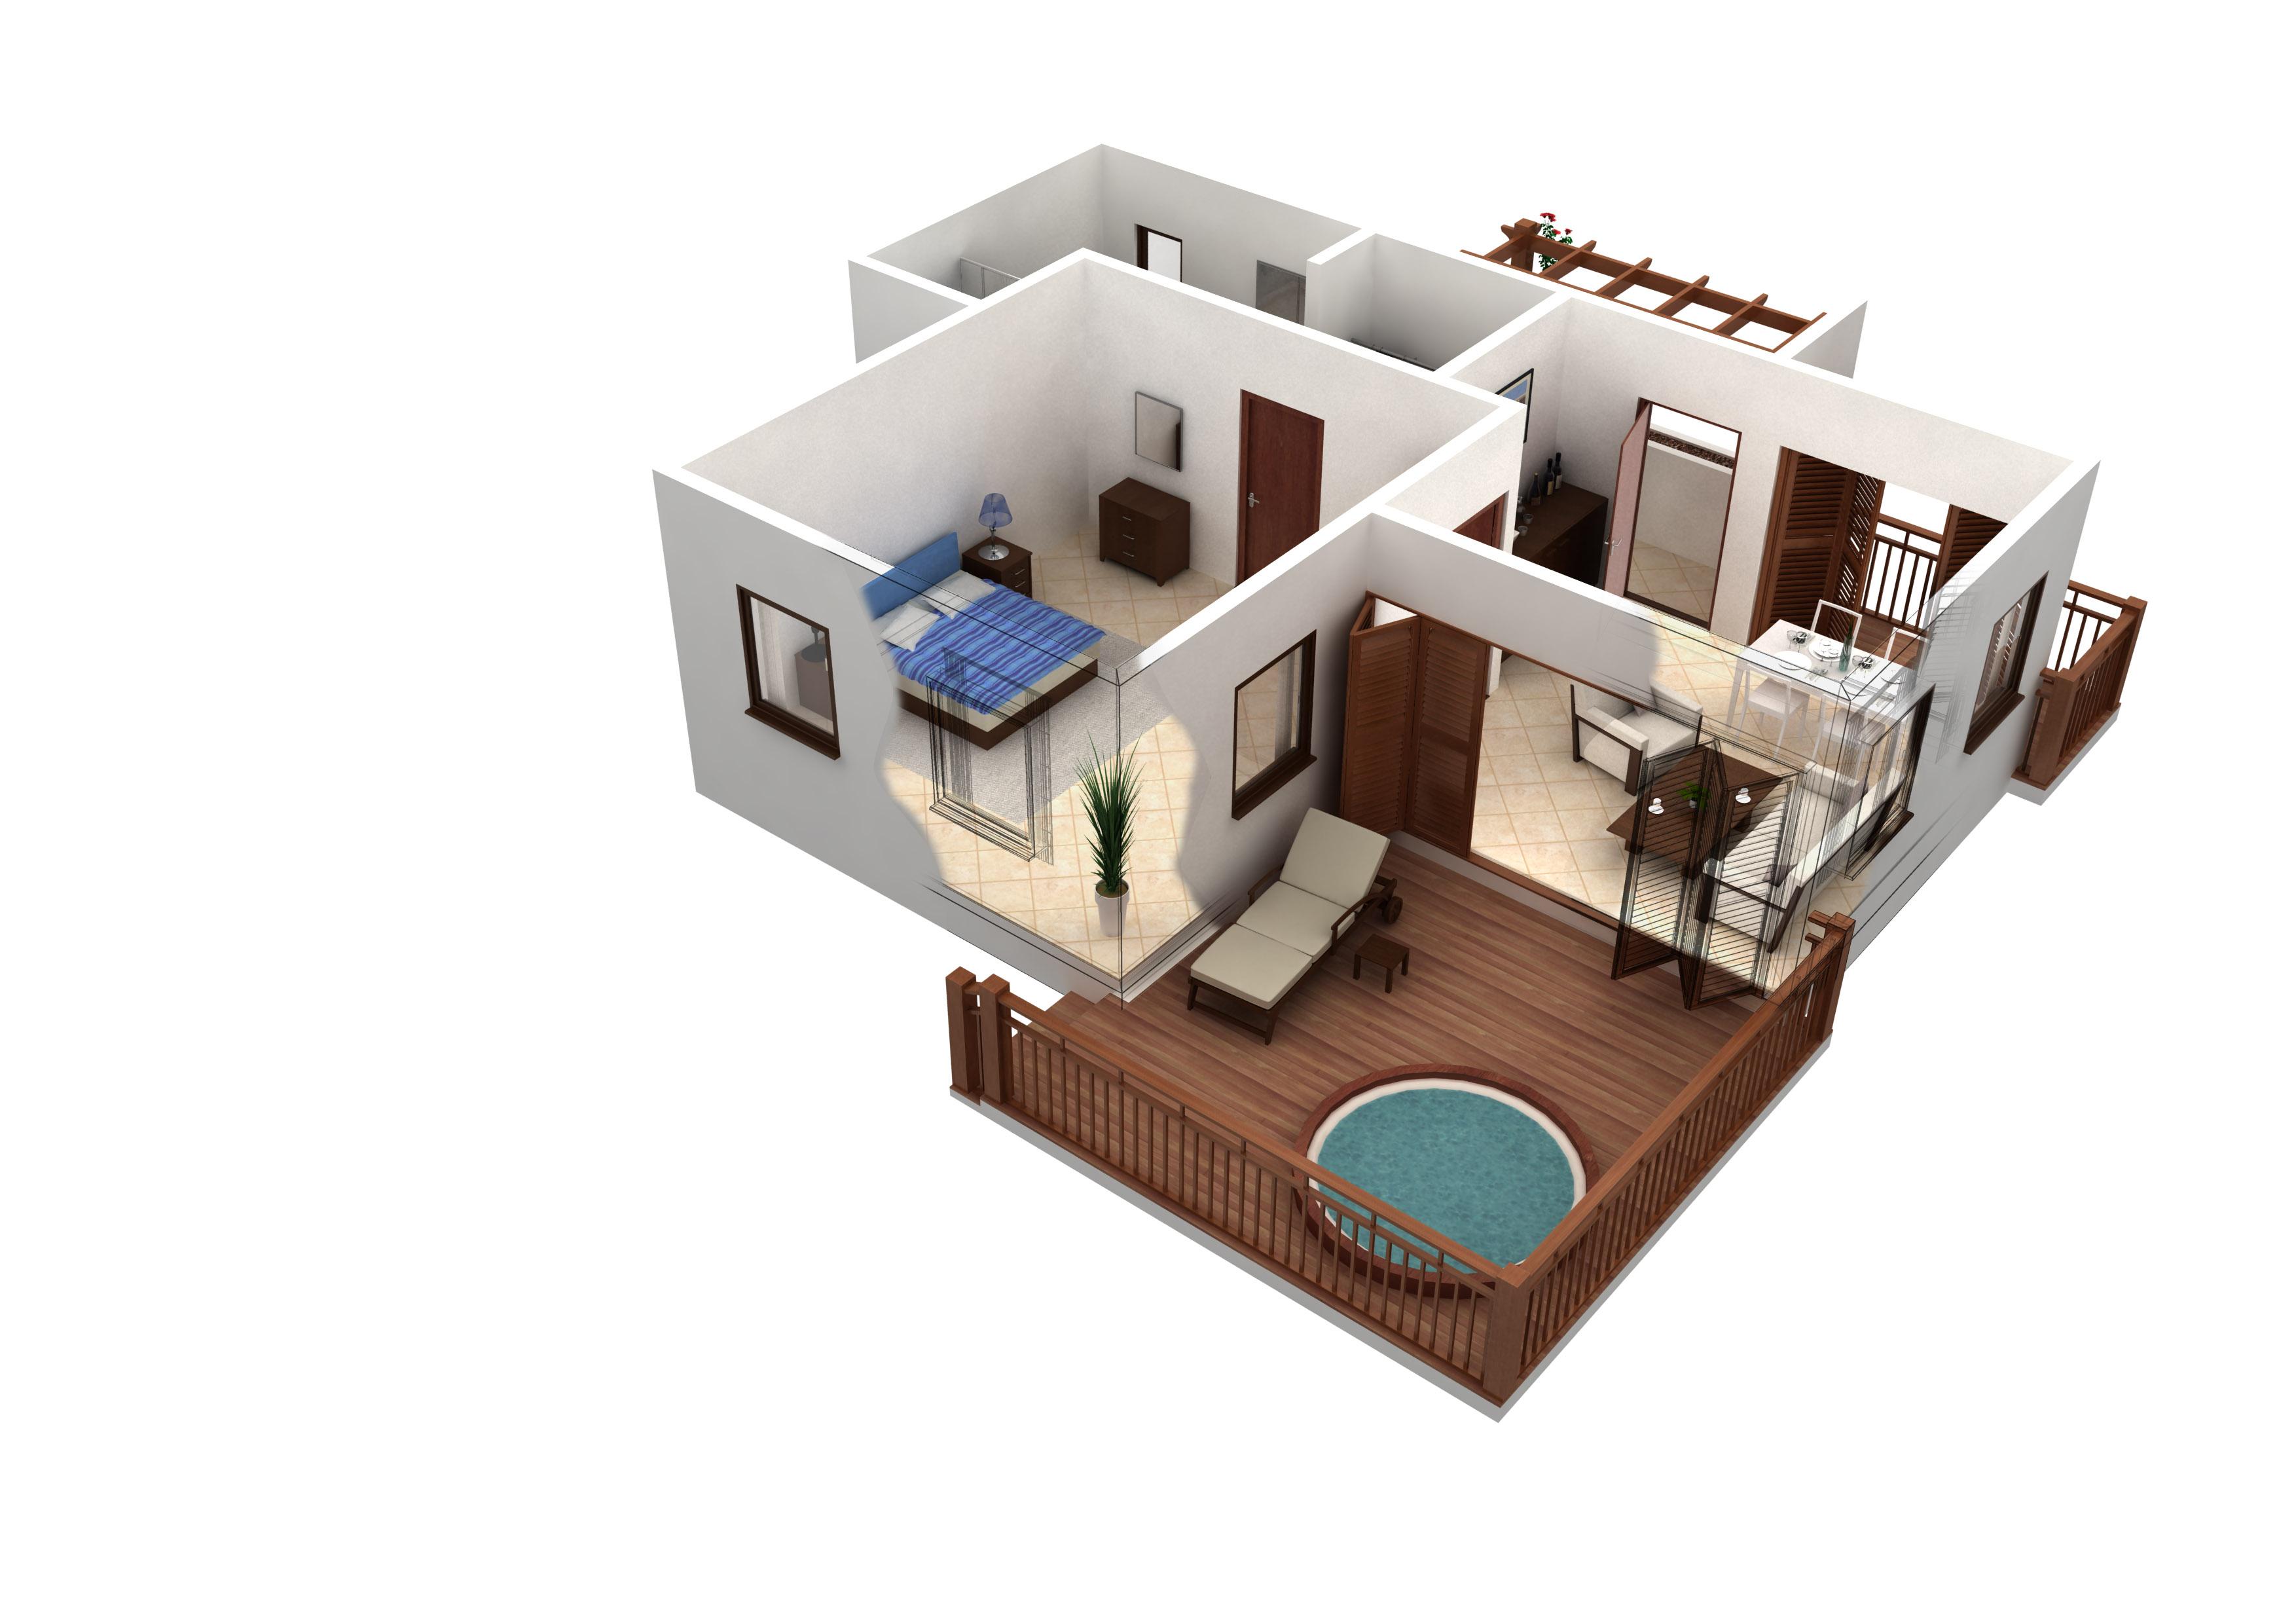 Merricks 1 Bed Cabana Floor Plan 700 Sq Ft ...